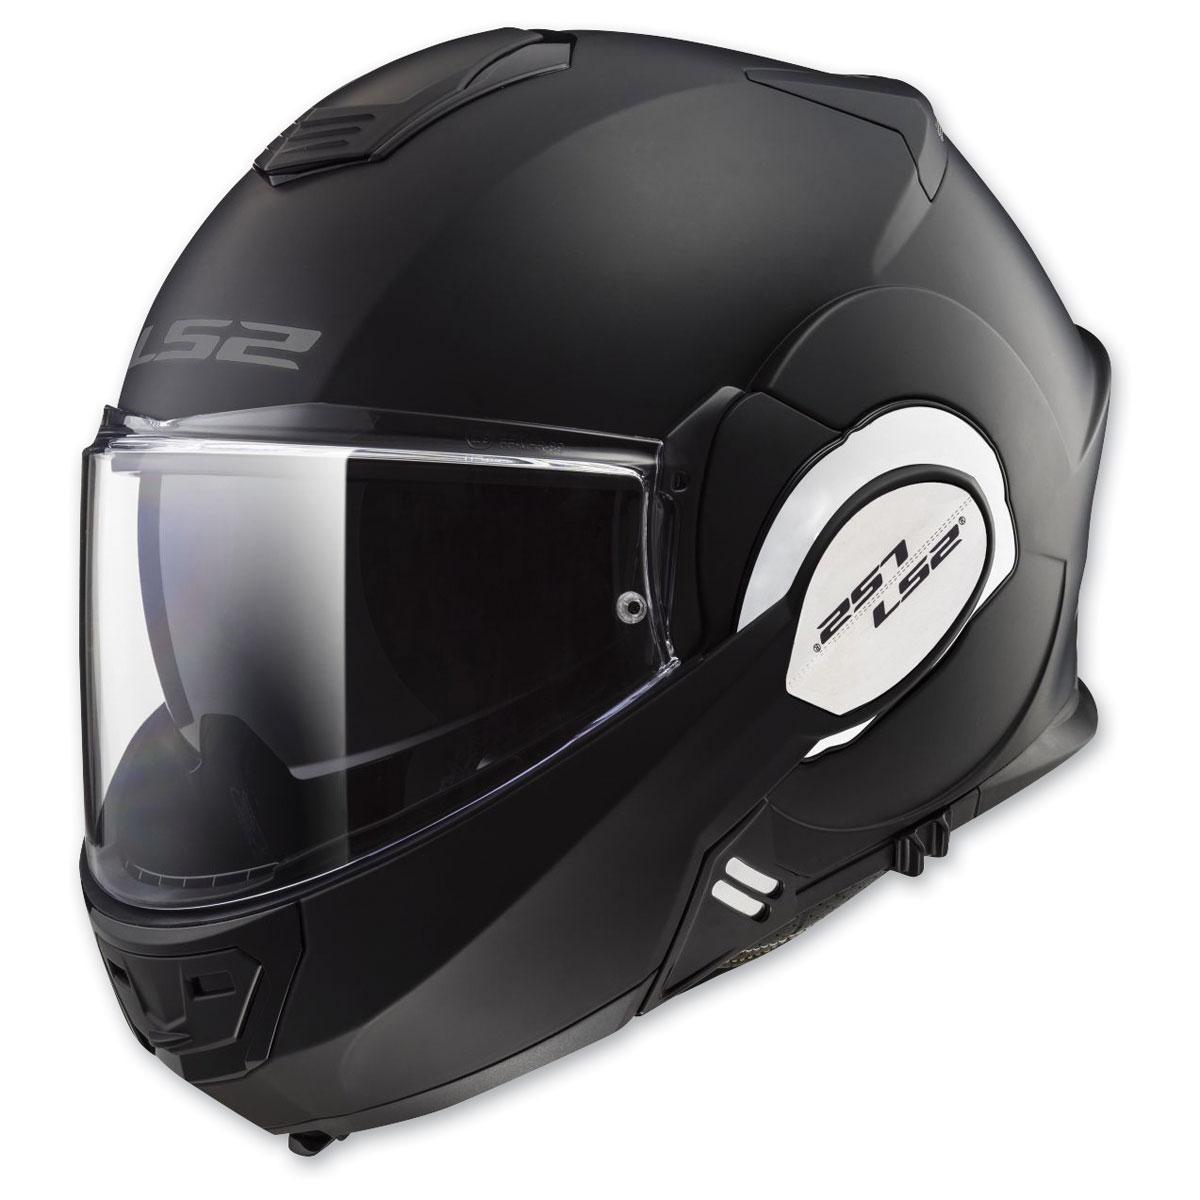 LS2 Valiant Black Chrome Modular Helmet